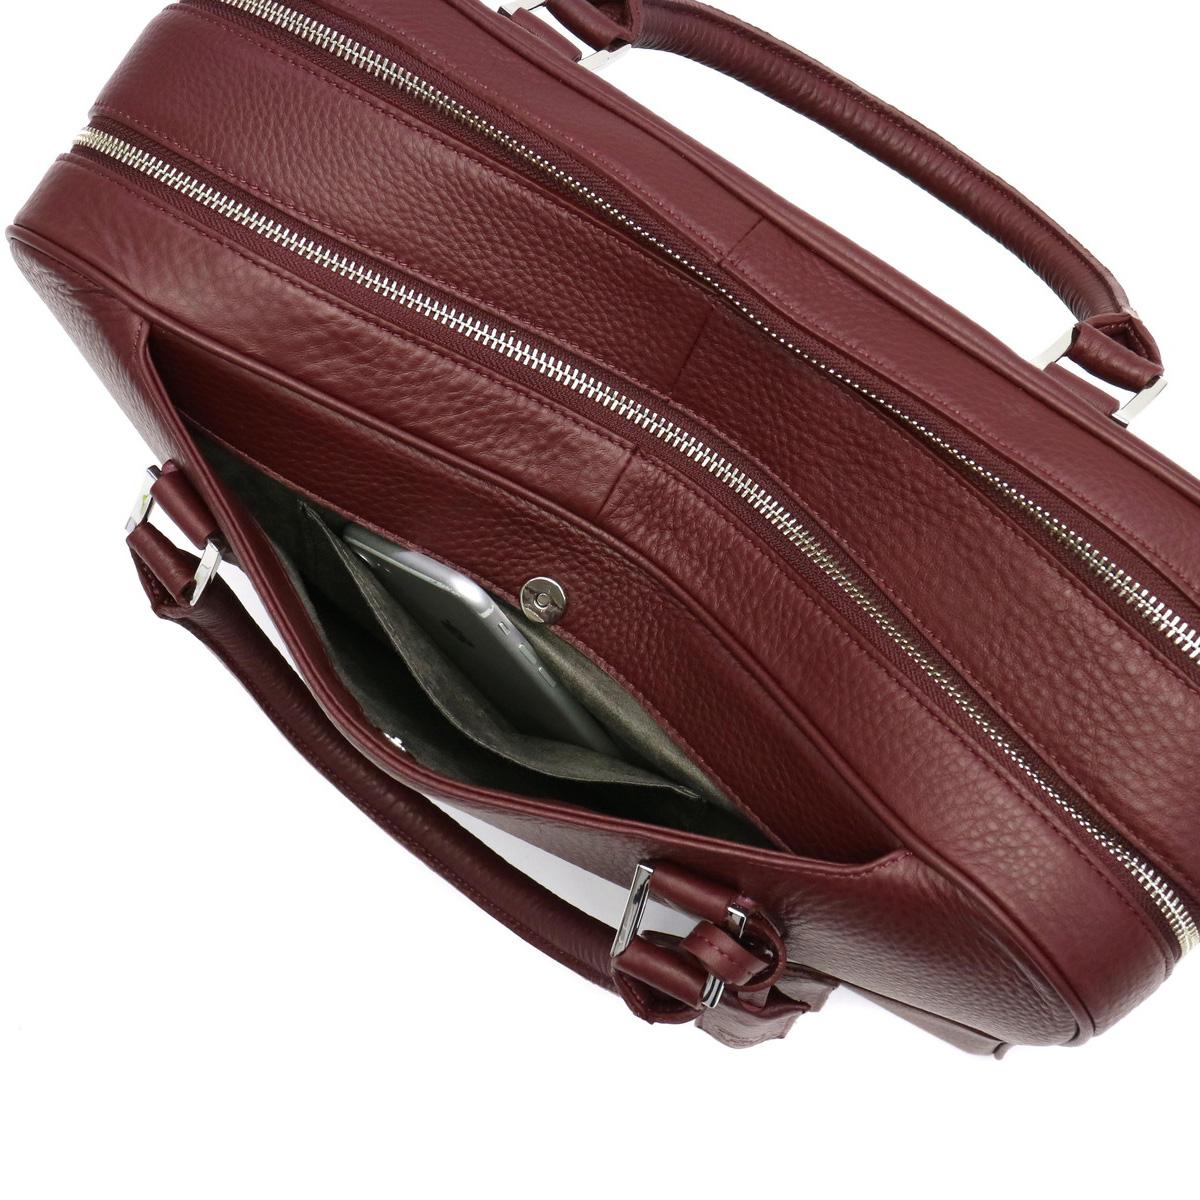 4b44cc9dc2d6 PELLE MORBIDA 2WAY briefcase business bag Men Women leather MB050 (MB023)